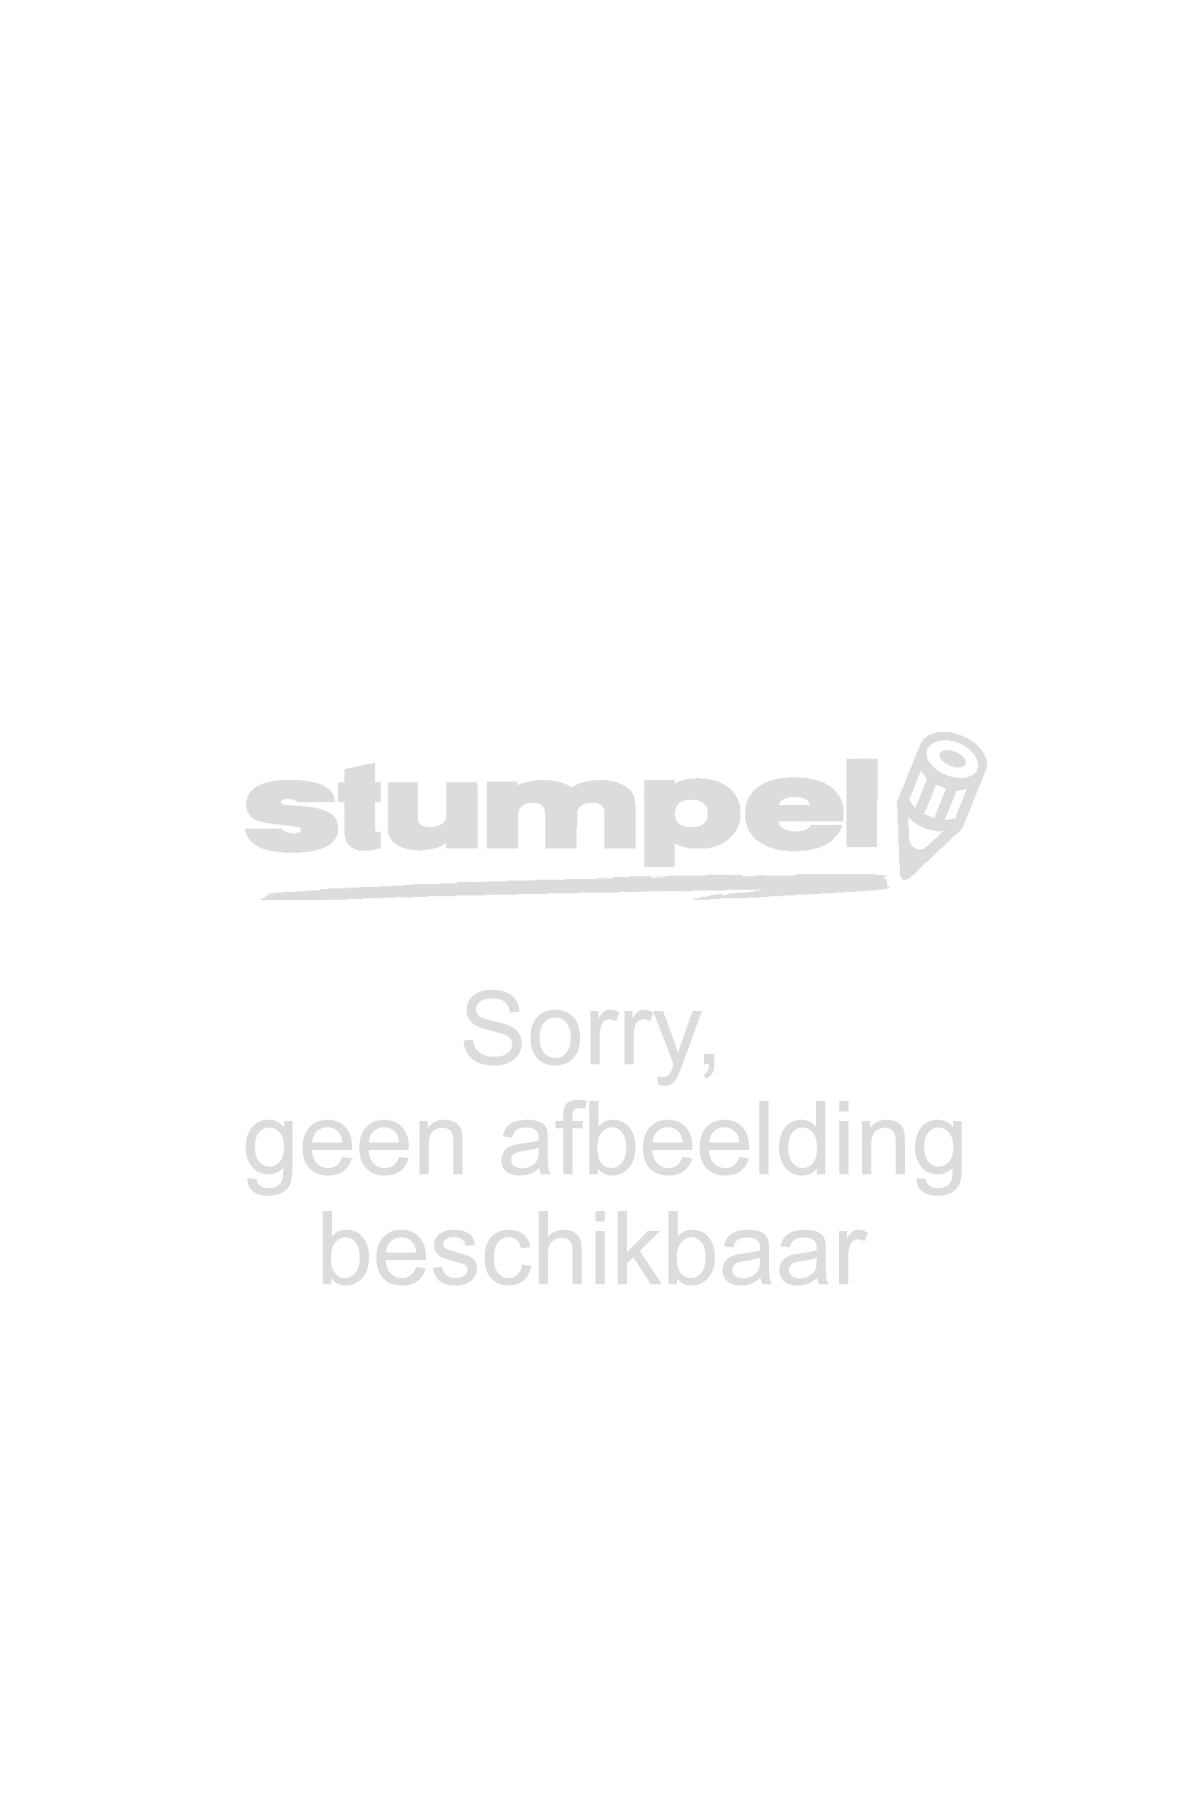 whiteboardstift-quantore-rond-1-1-5mm-blauw-630533